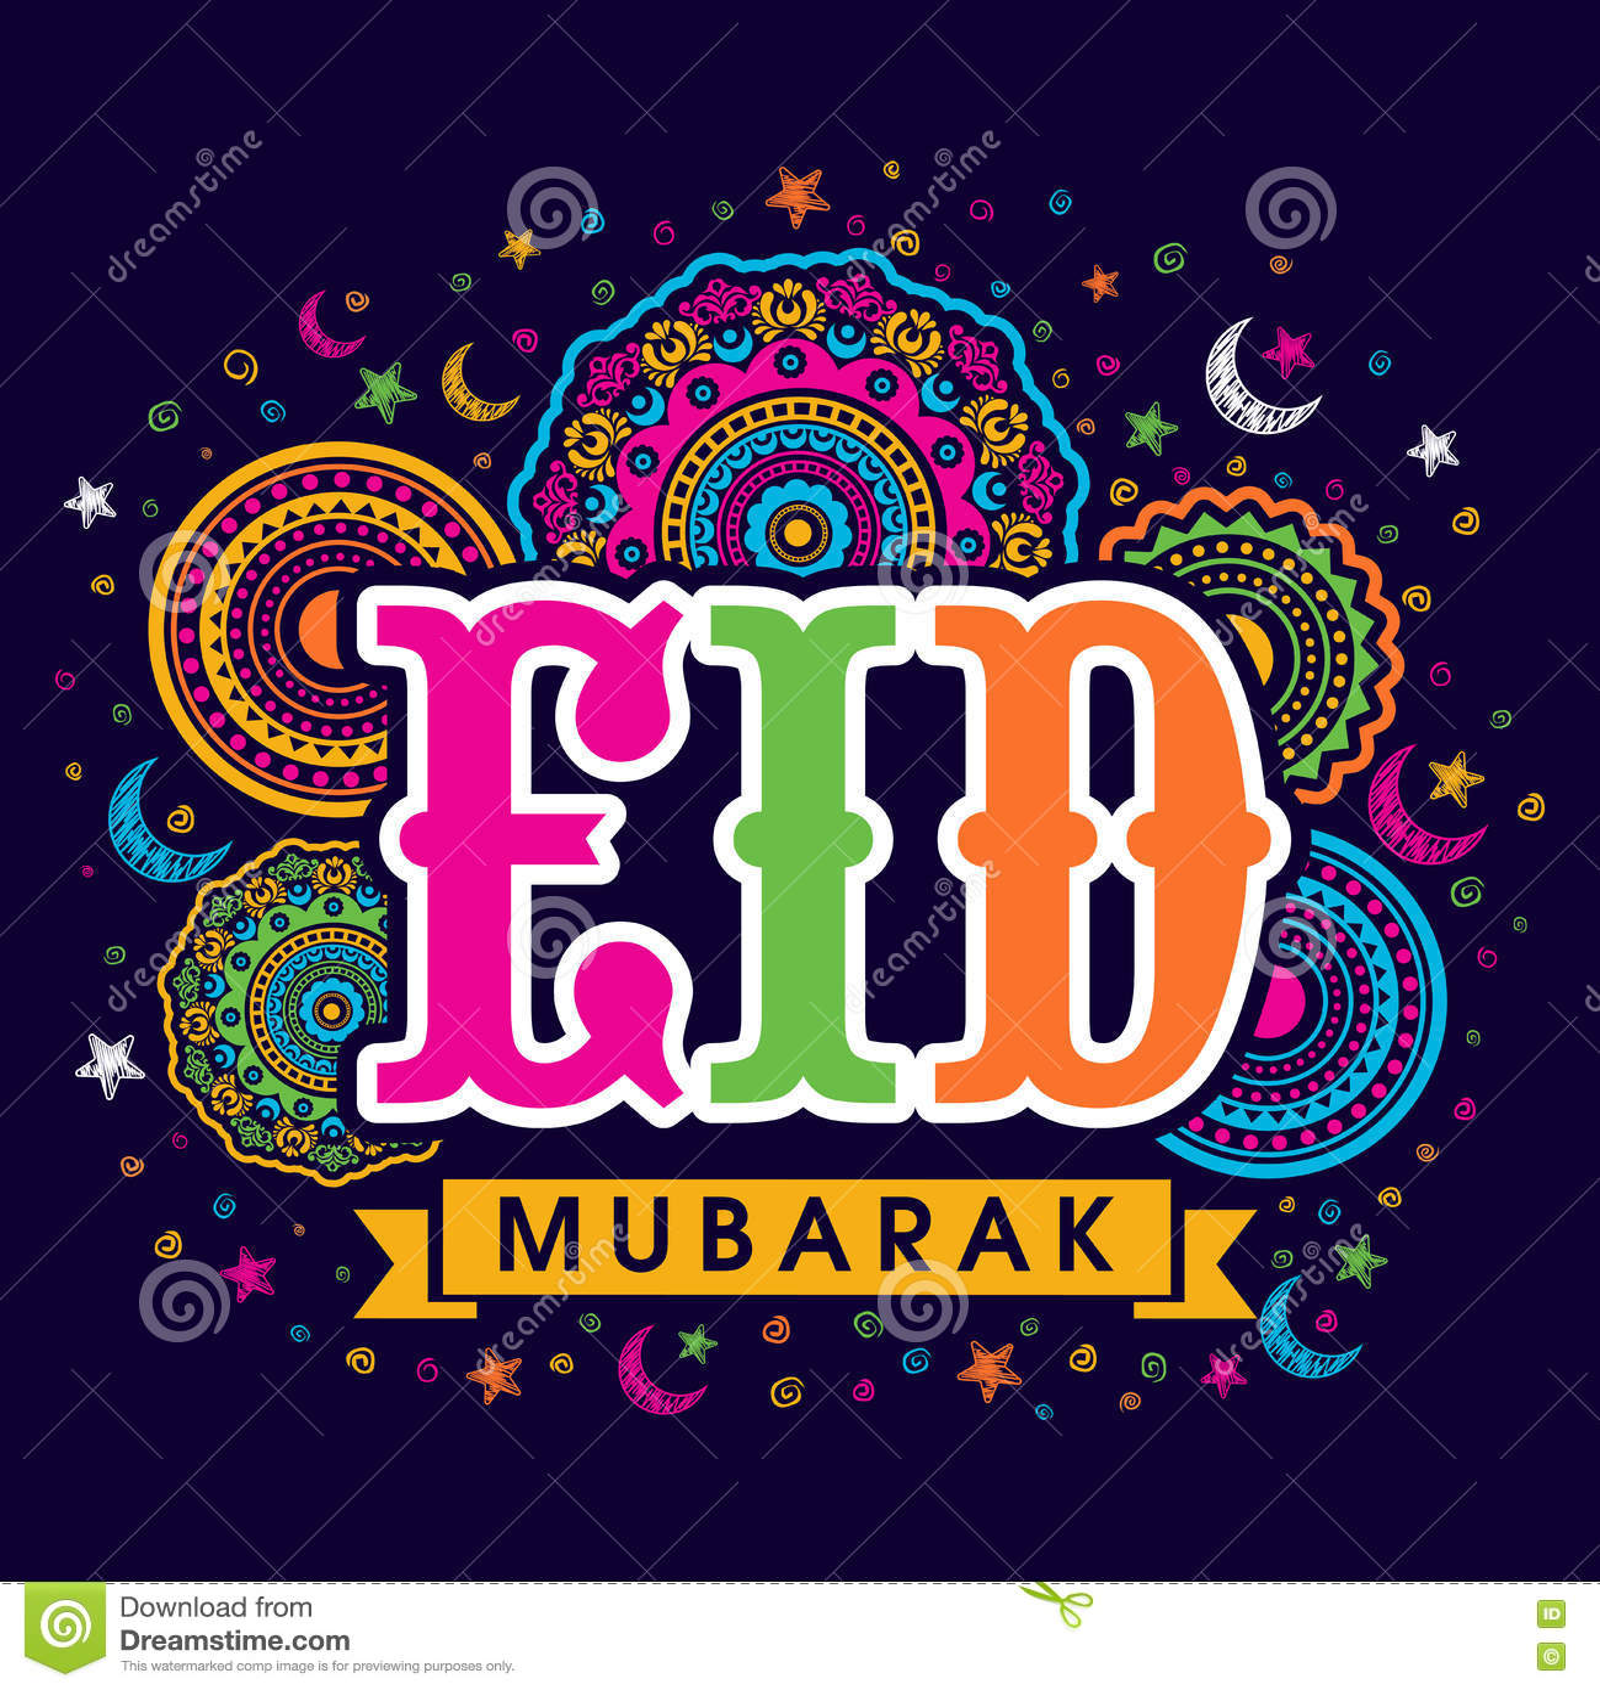 Greeting card for eid mubarak celebration stock illustration greeting card for eid mubarak celebration m4hsunfo